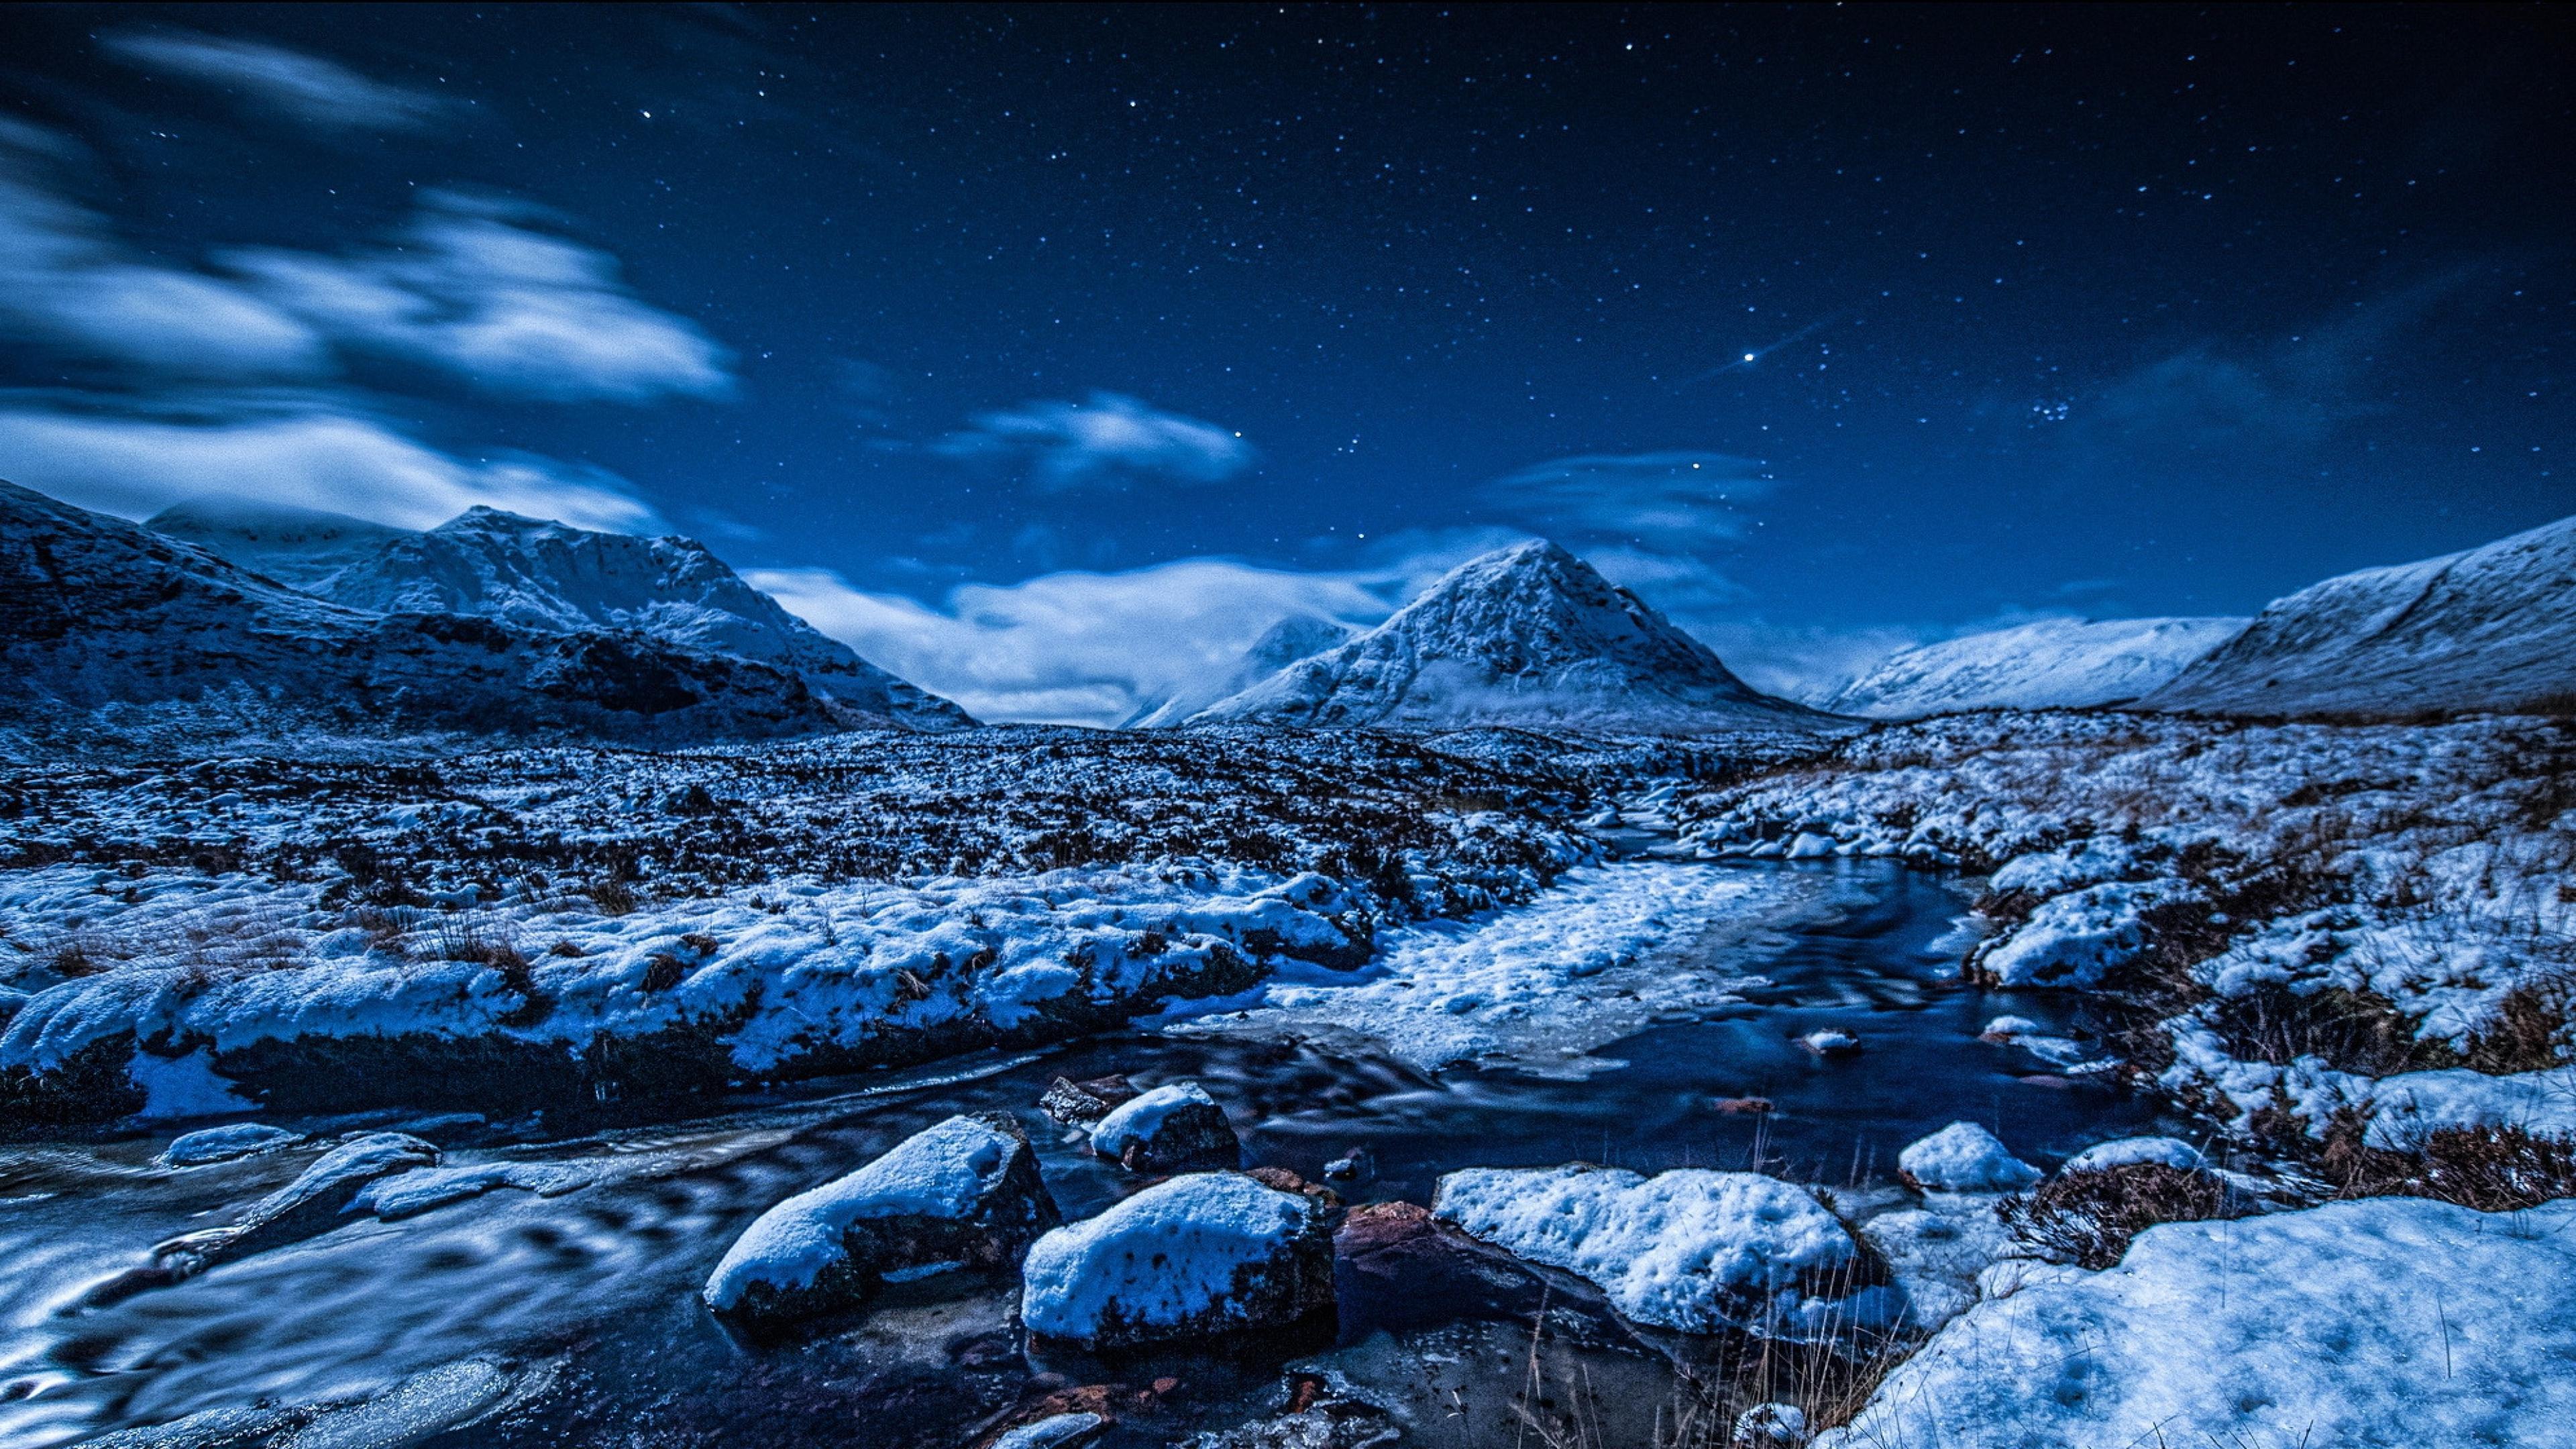 3840x2160 Wallpaper night sky stars mountains stream snow winter 3840x2160